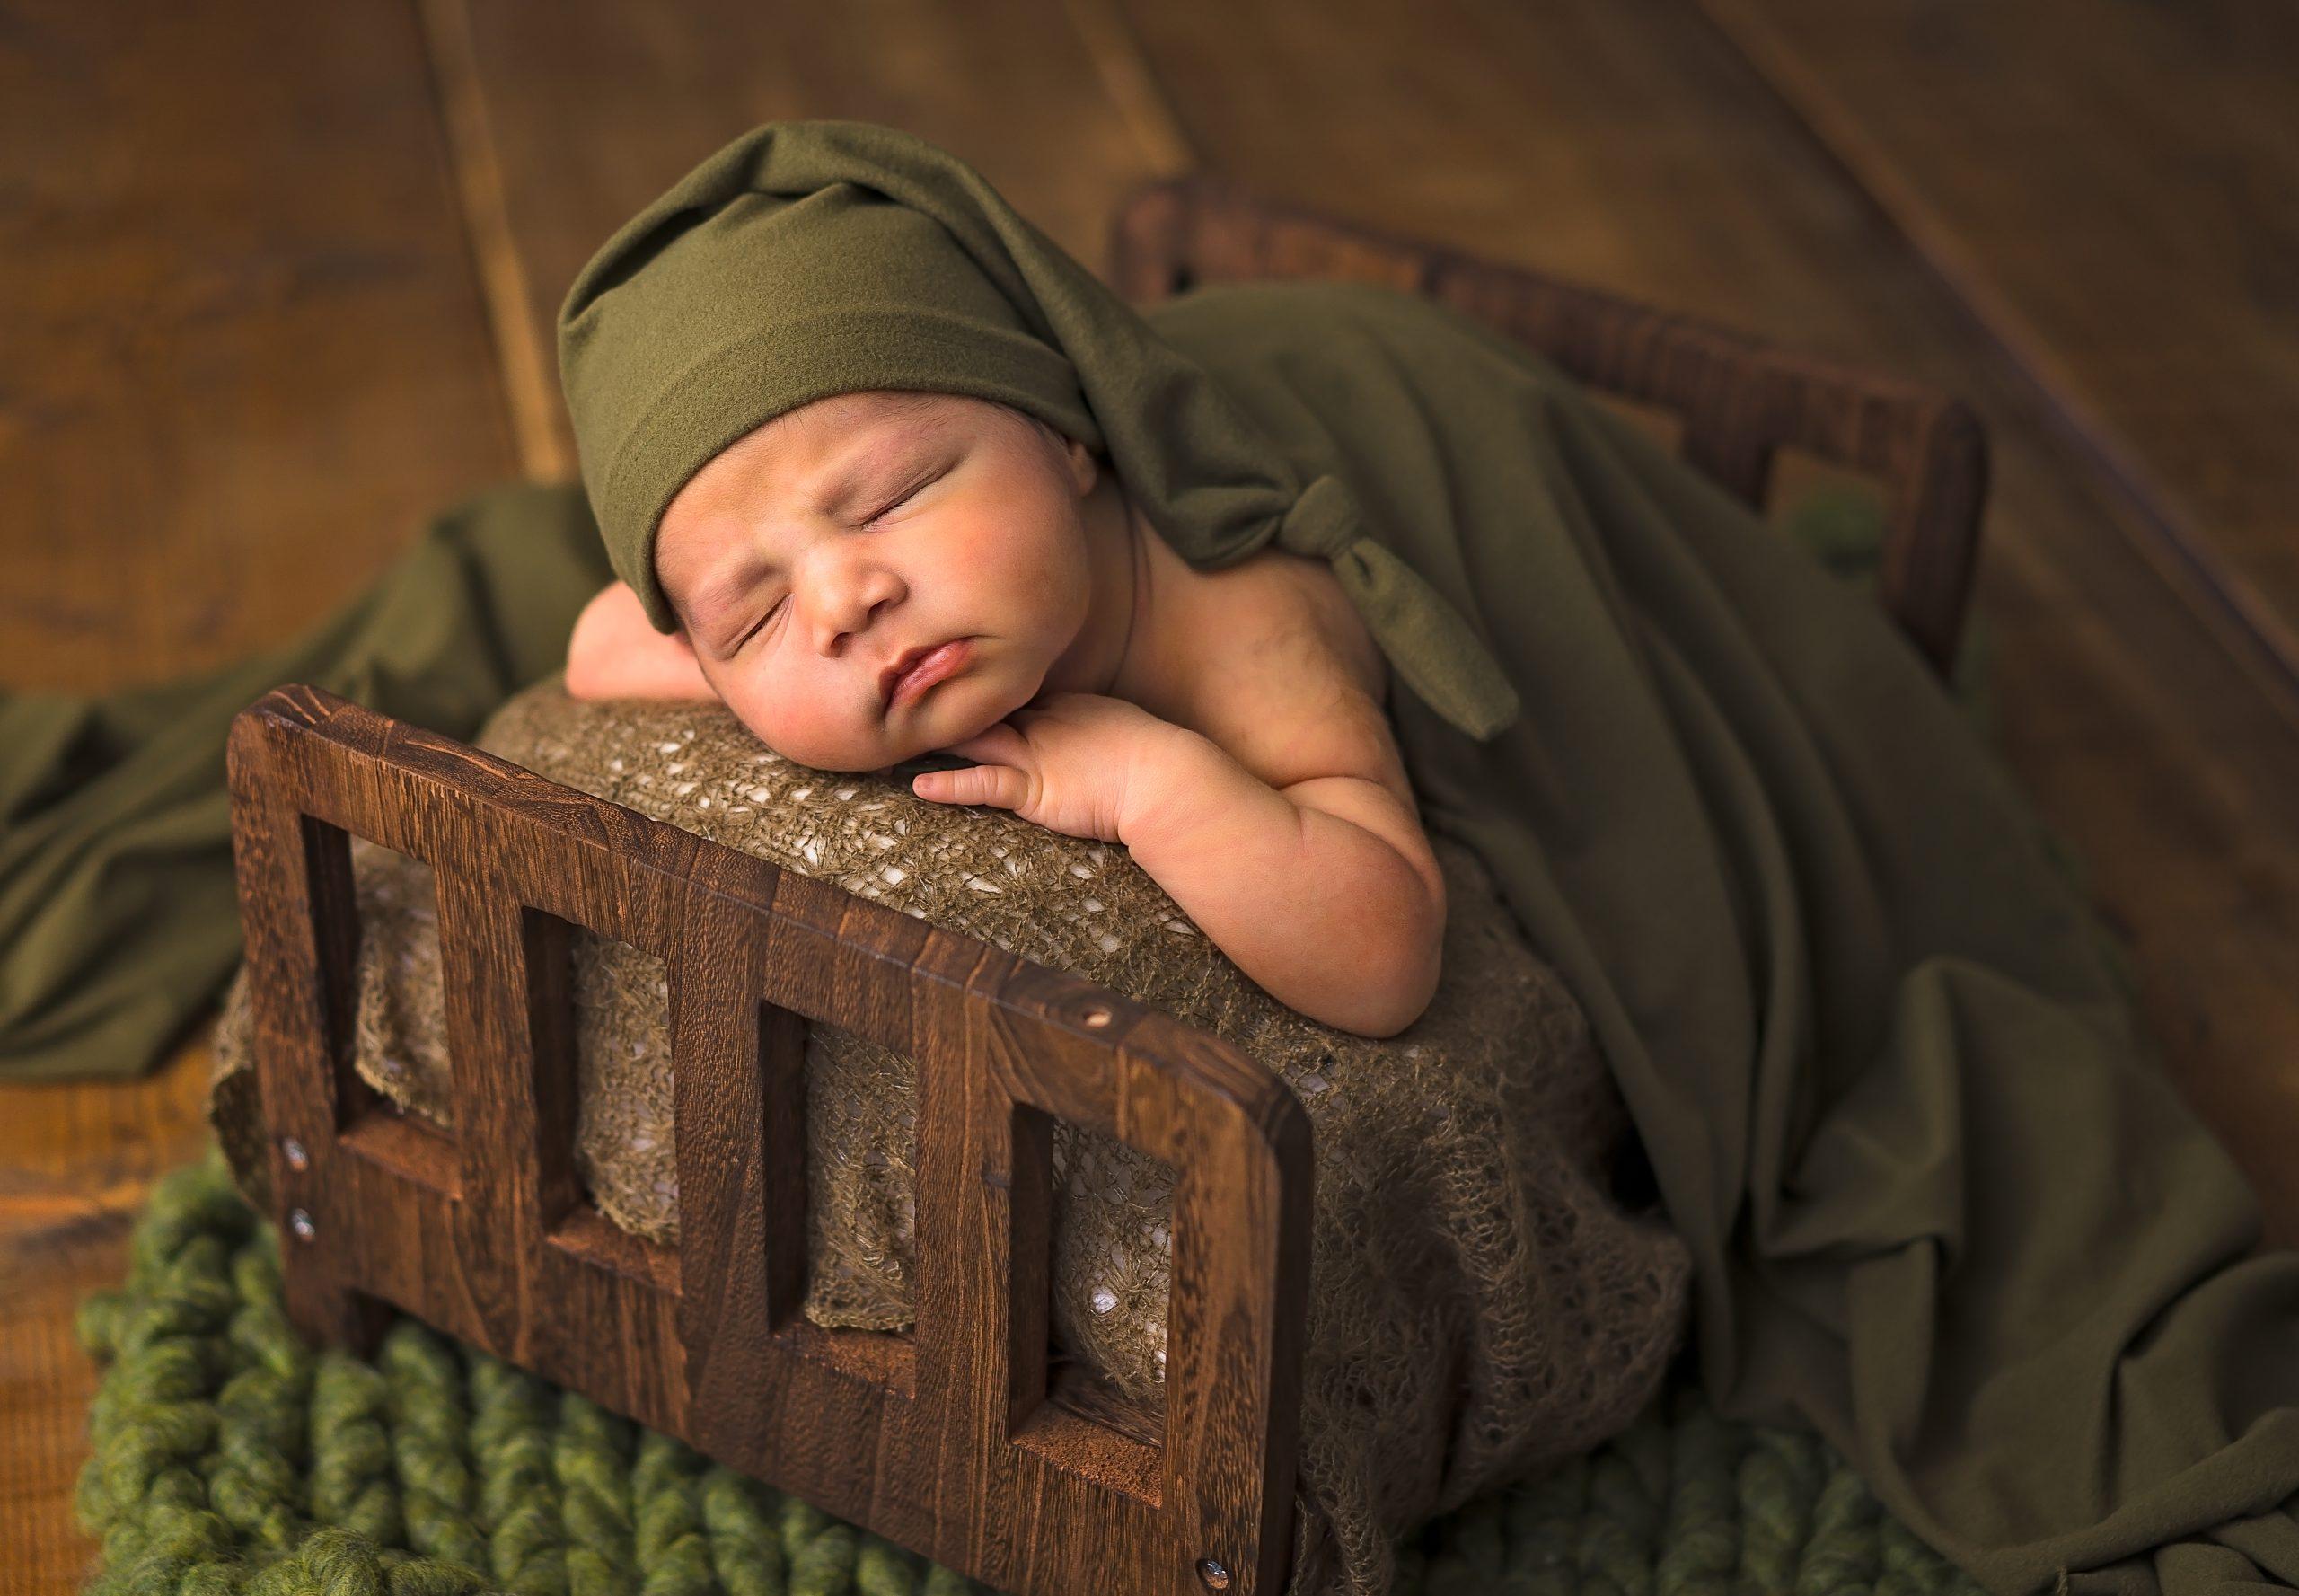 Newborn Baby Sleeping on a Bed with Green Sleeping Cap